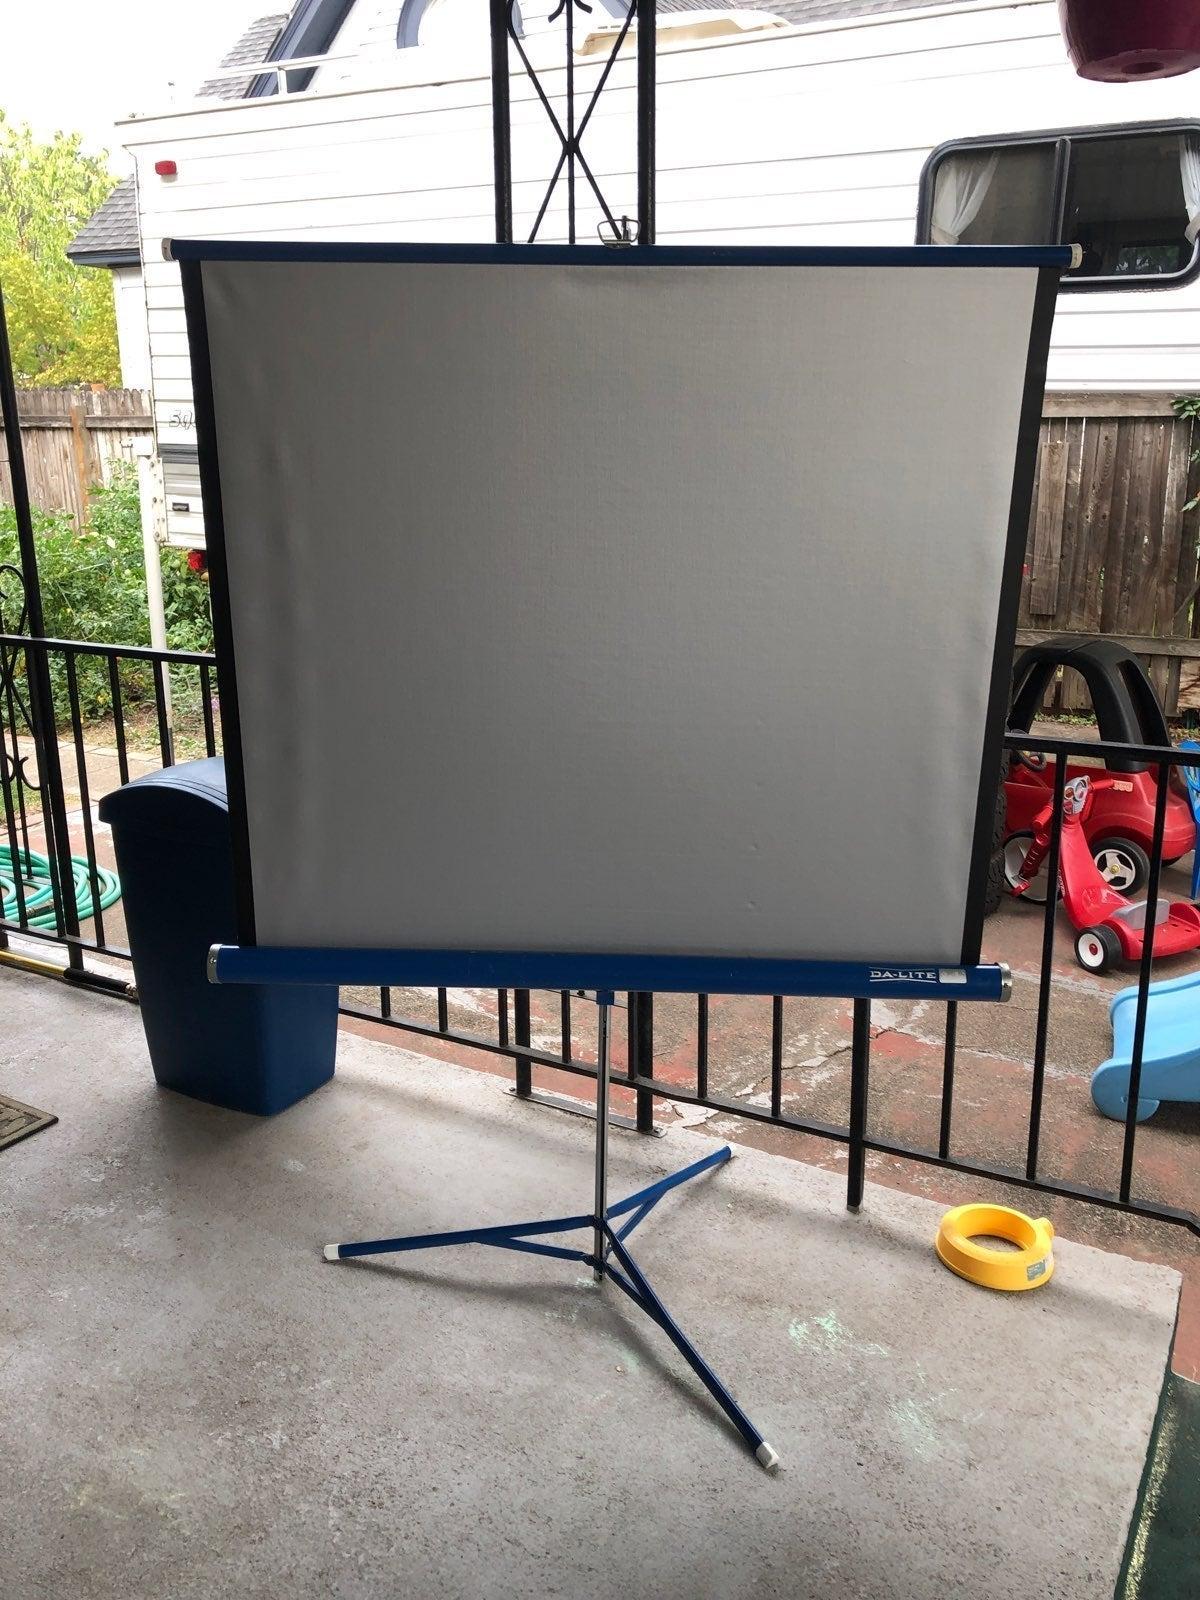 Da Lite Movie Screen.Da Lite Projector